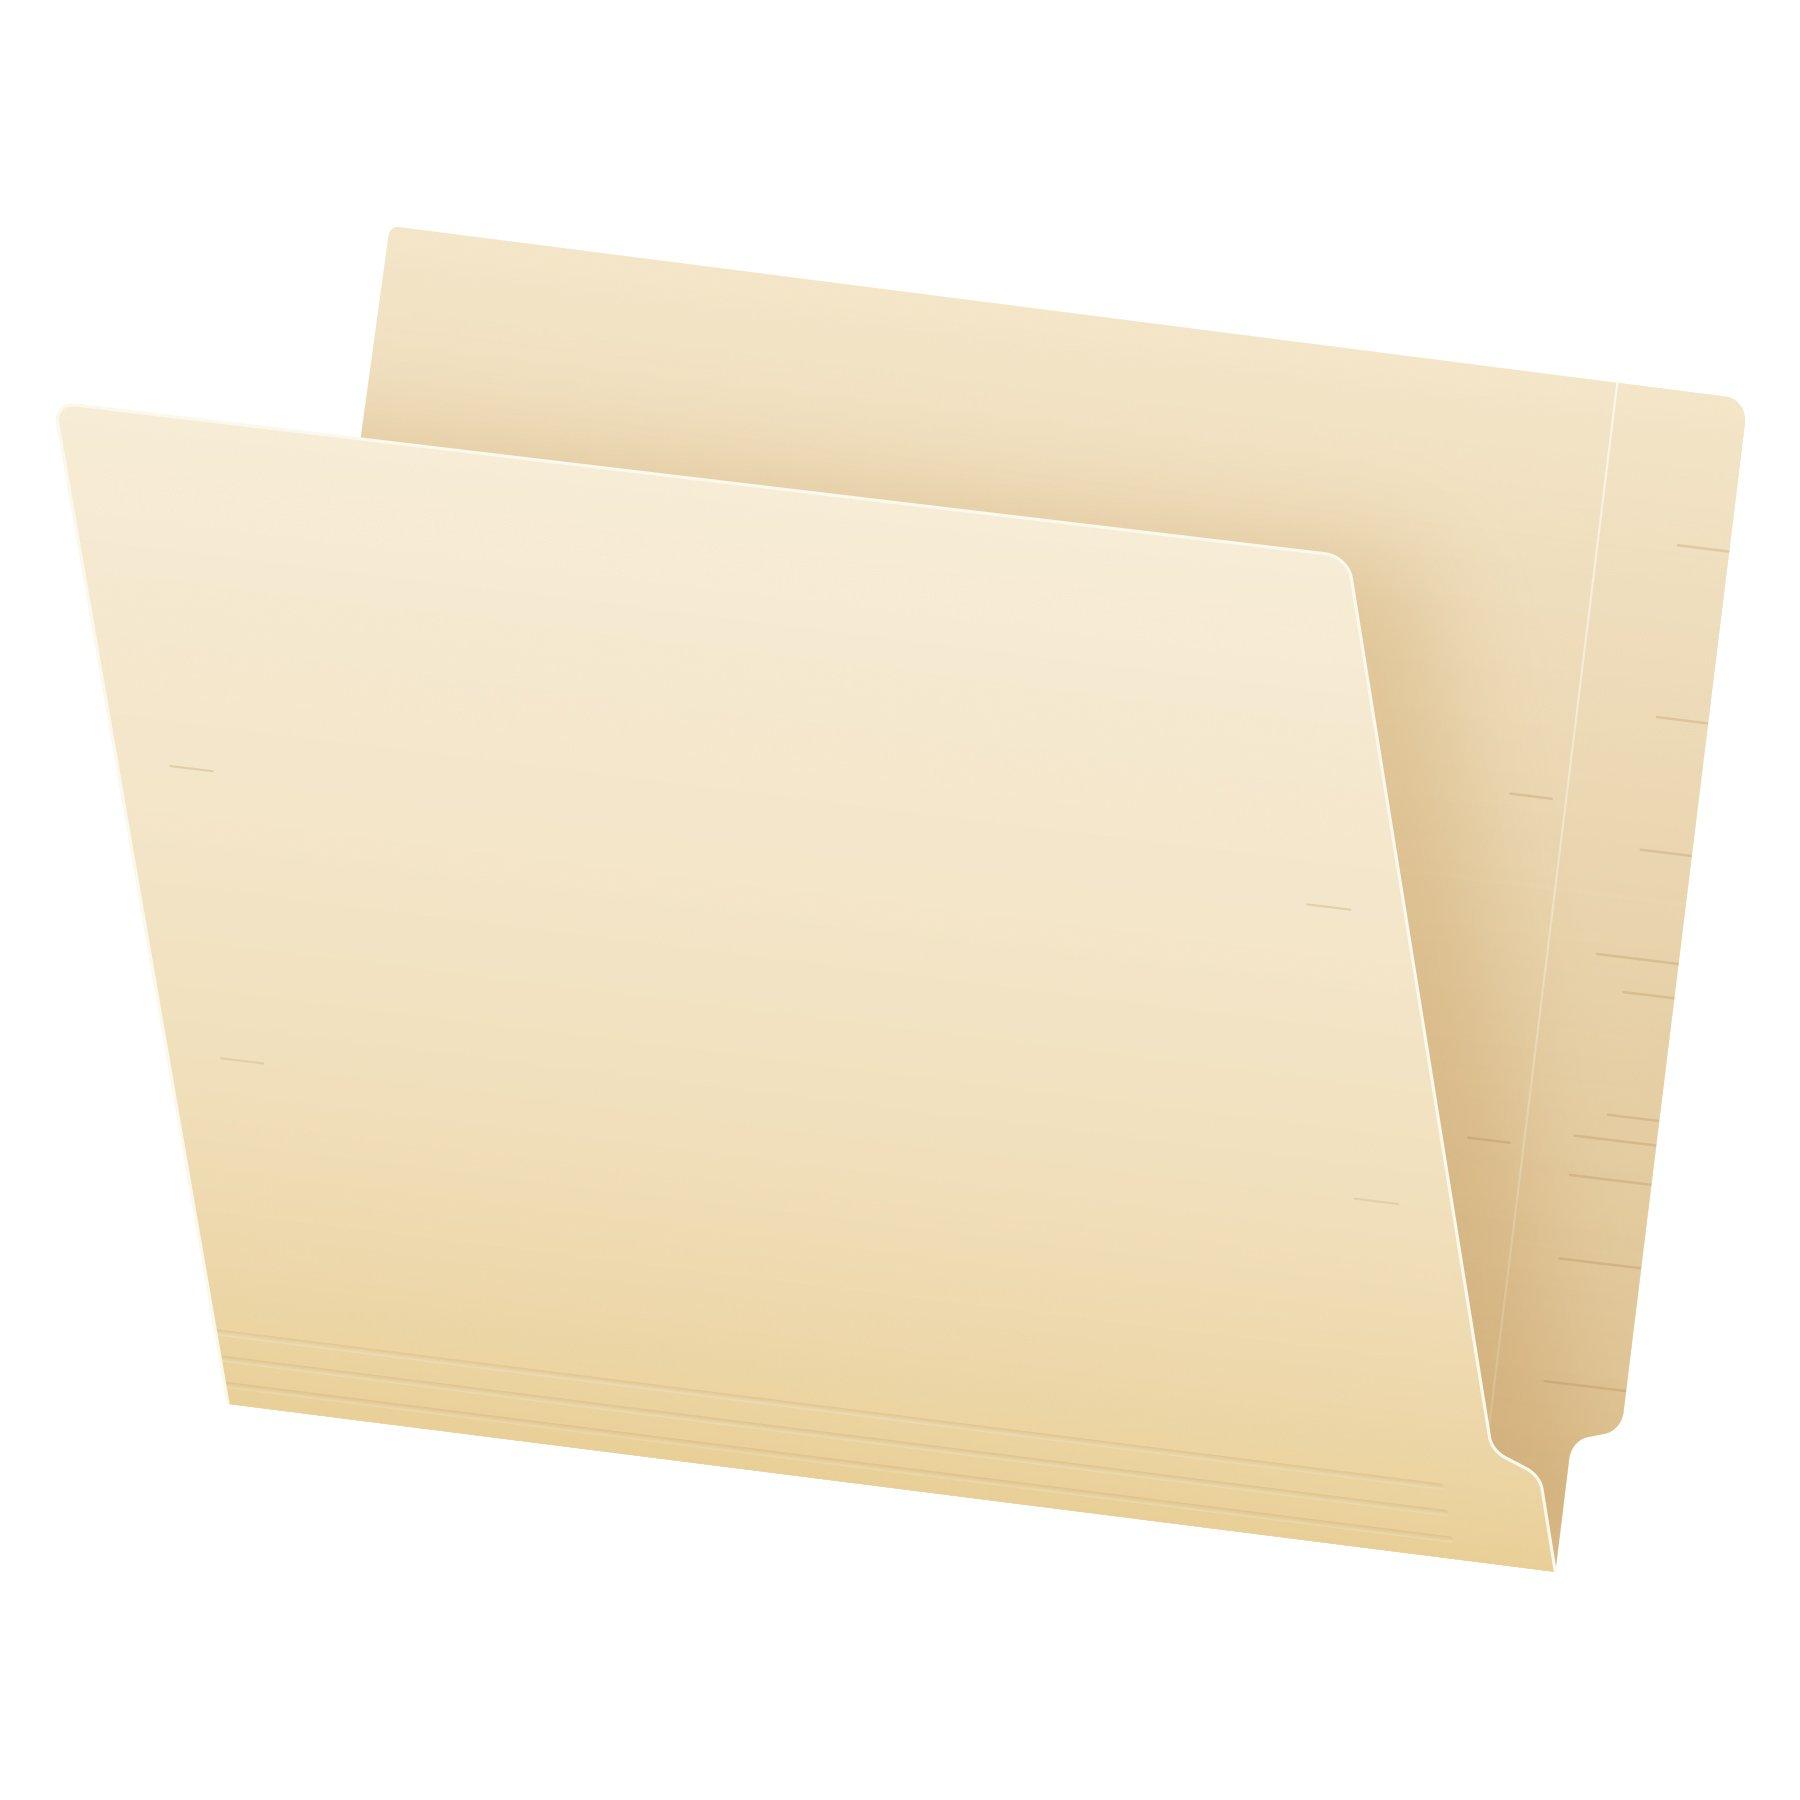 Pendaflex Manila End-Tab Fastener Folders, Letter Size, 2 Fasteners, Manila, Straight Cut, 50/BX (44120)